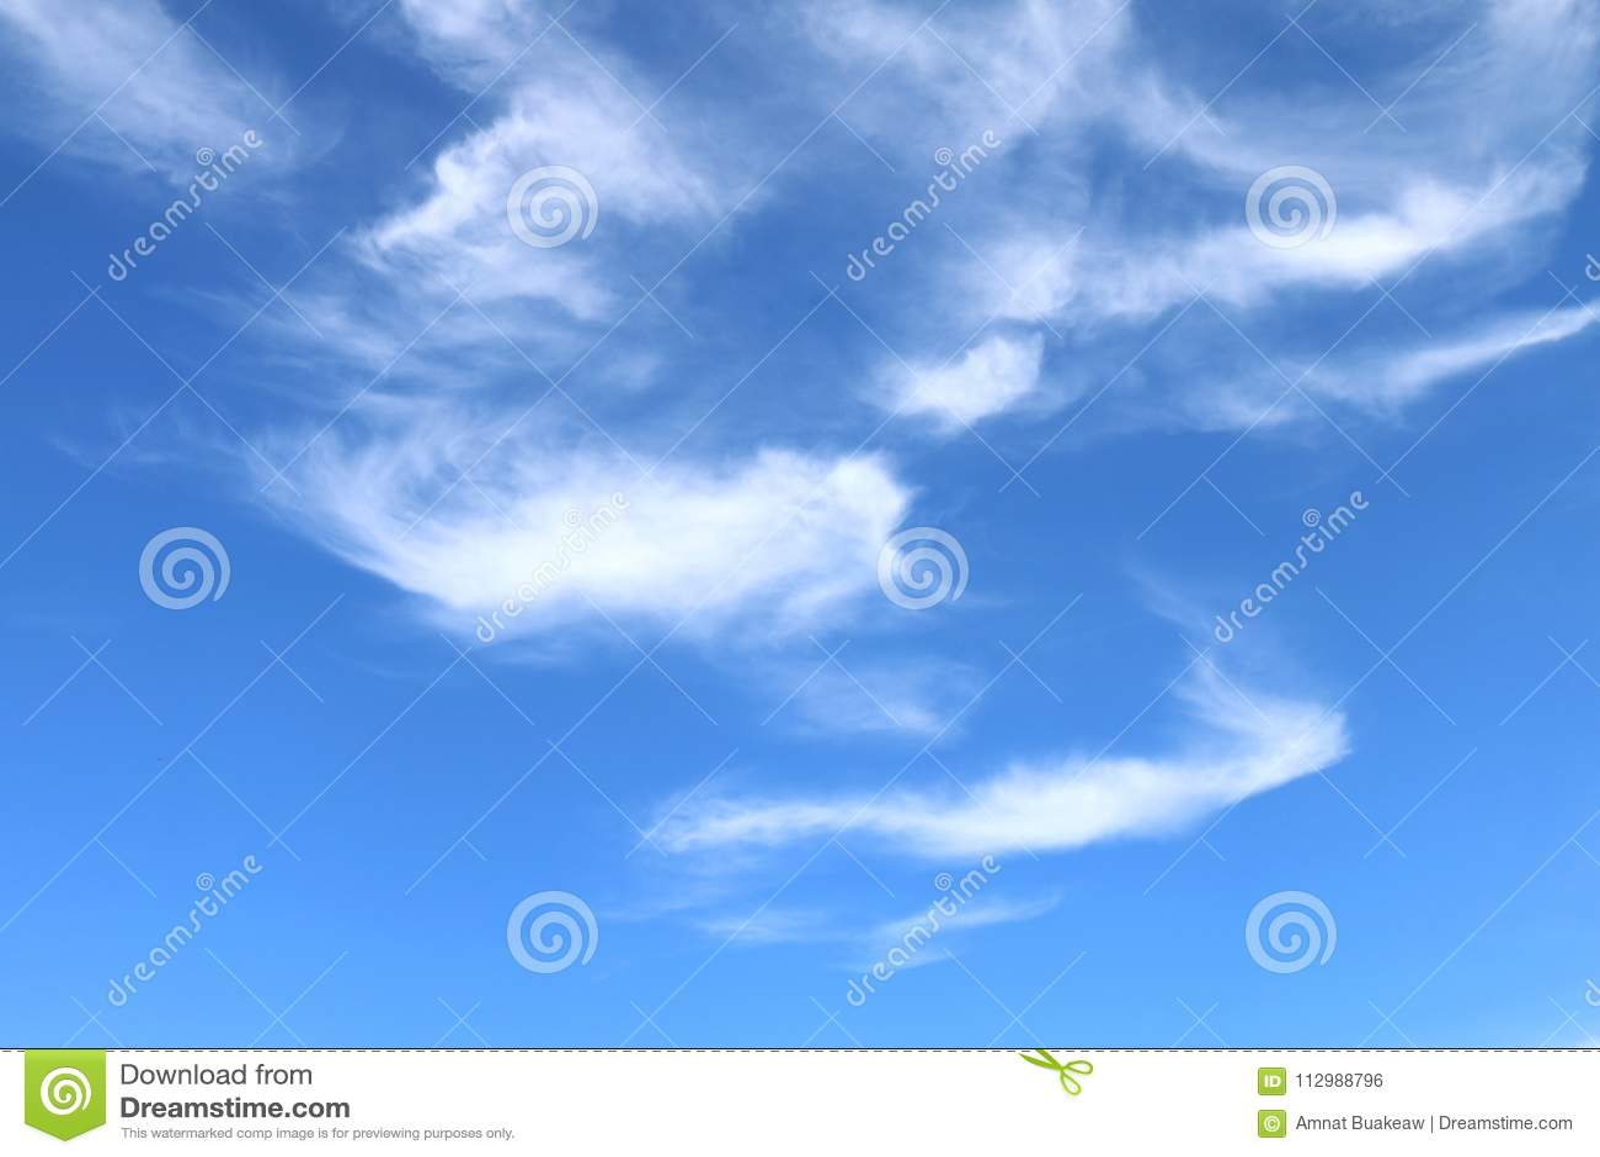 Sky, Clear sky soft cloud, Sky blue background, sky view